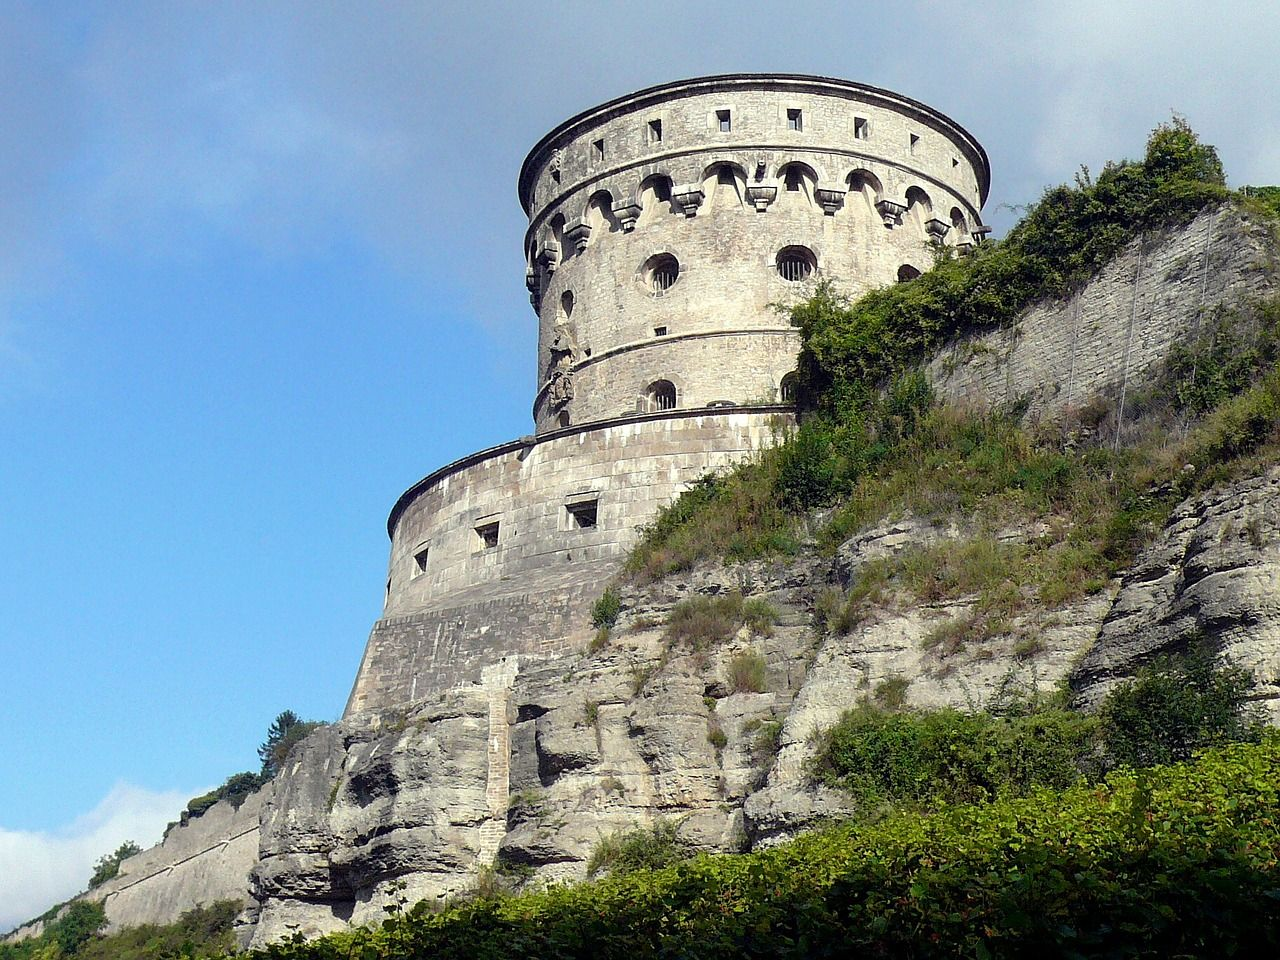 Castle Tower Middle Ages Castle Tower Castle Tower